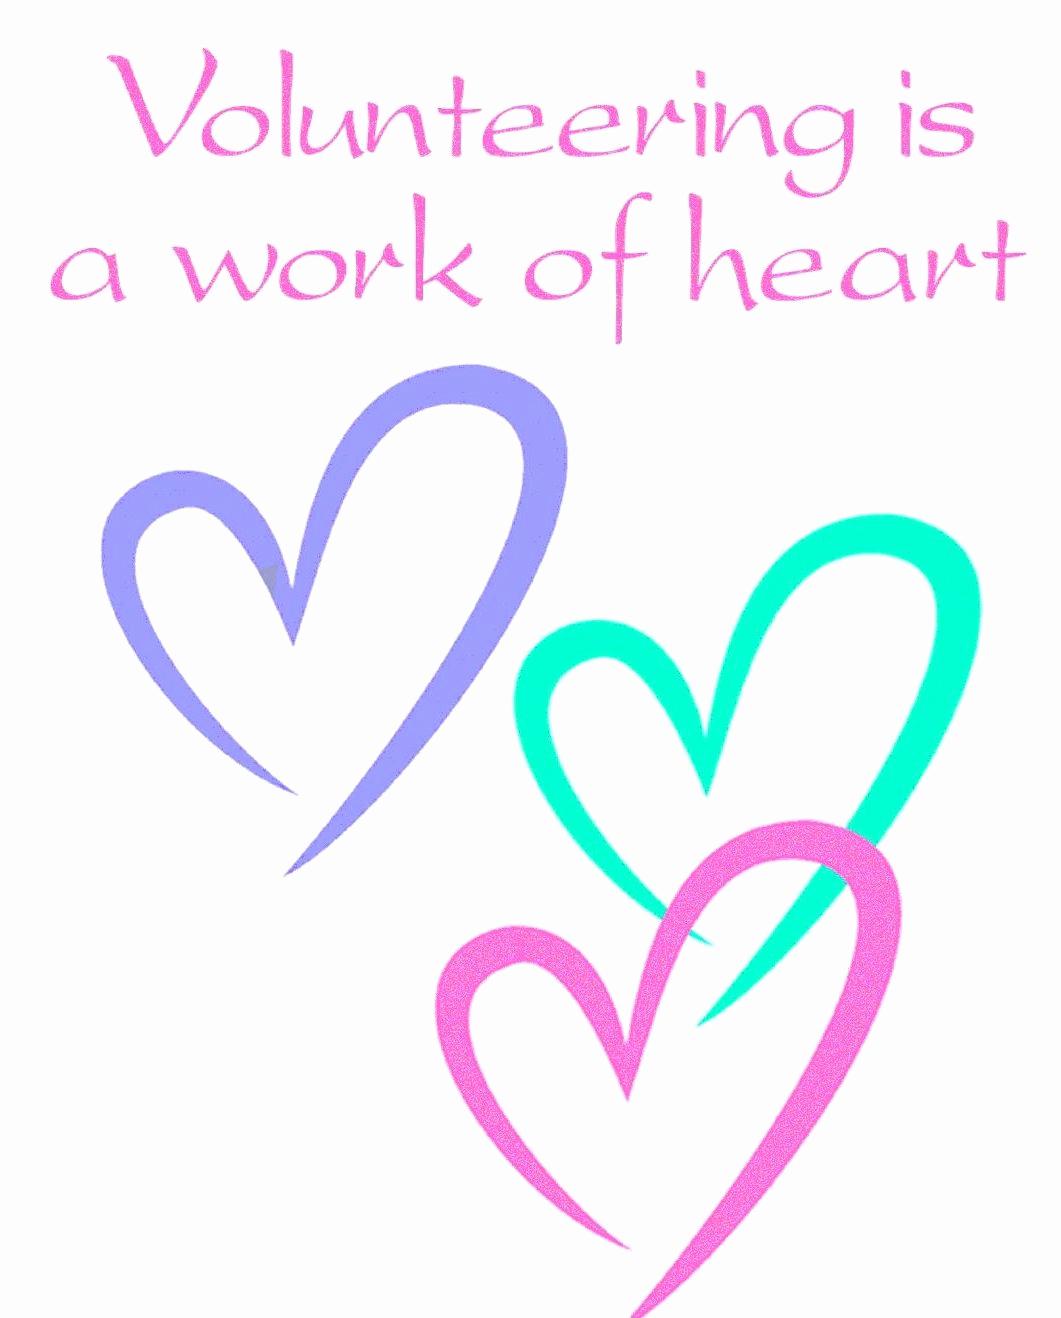 Thank You for Volunteering New Hospice Volunteer Appreciation Quotes Quotesgram